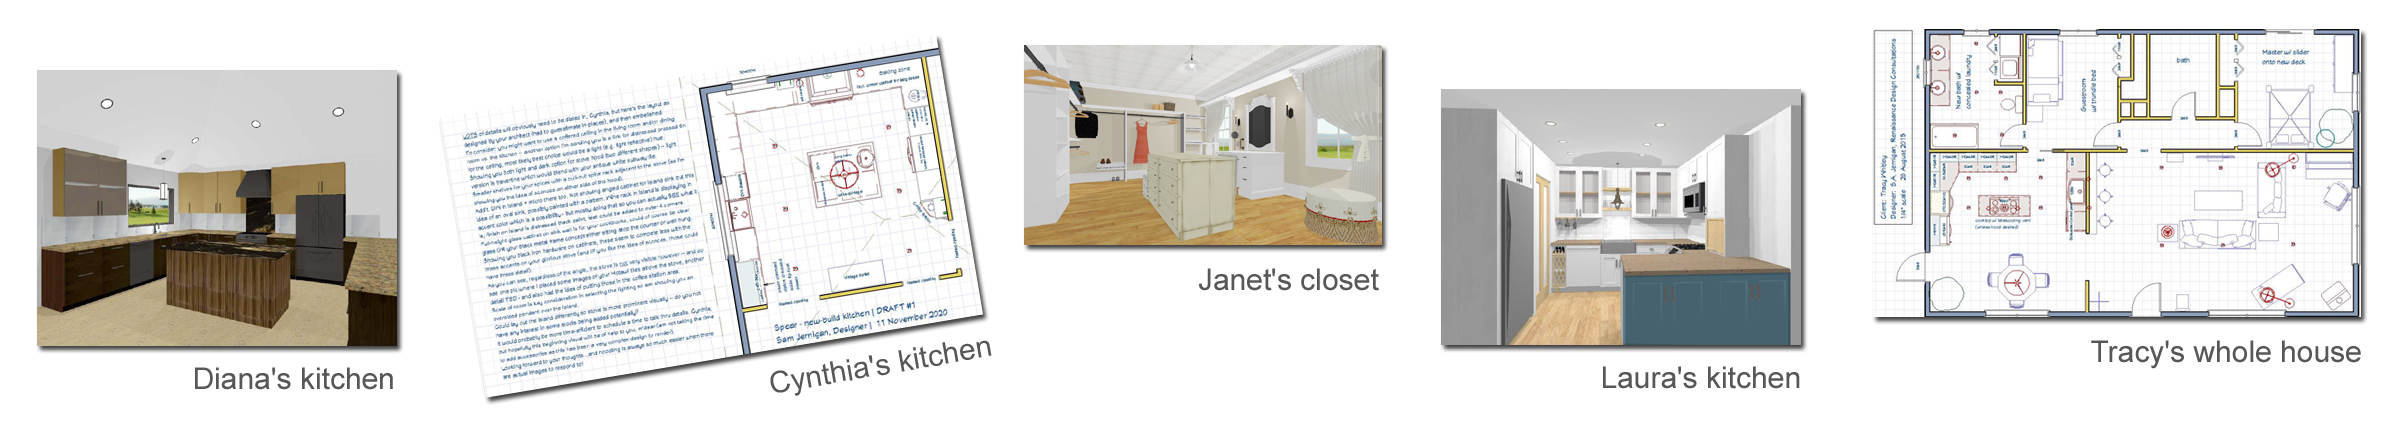 client renderings 2D & 3D by Designer Sam Jernigan